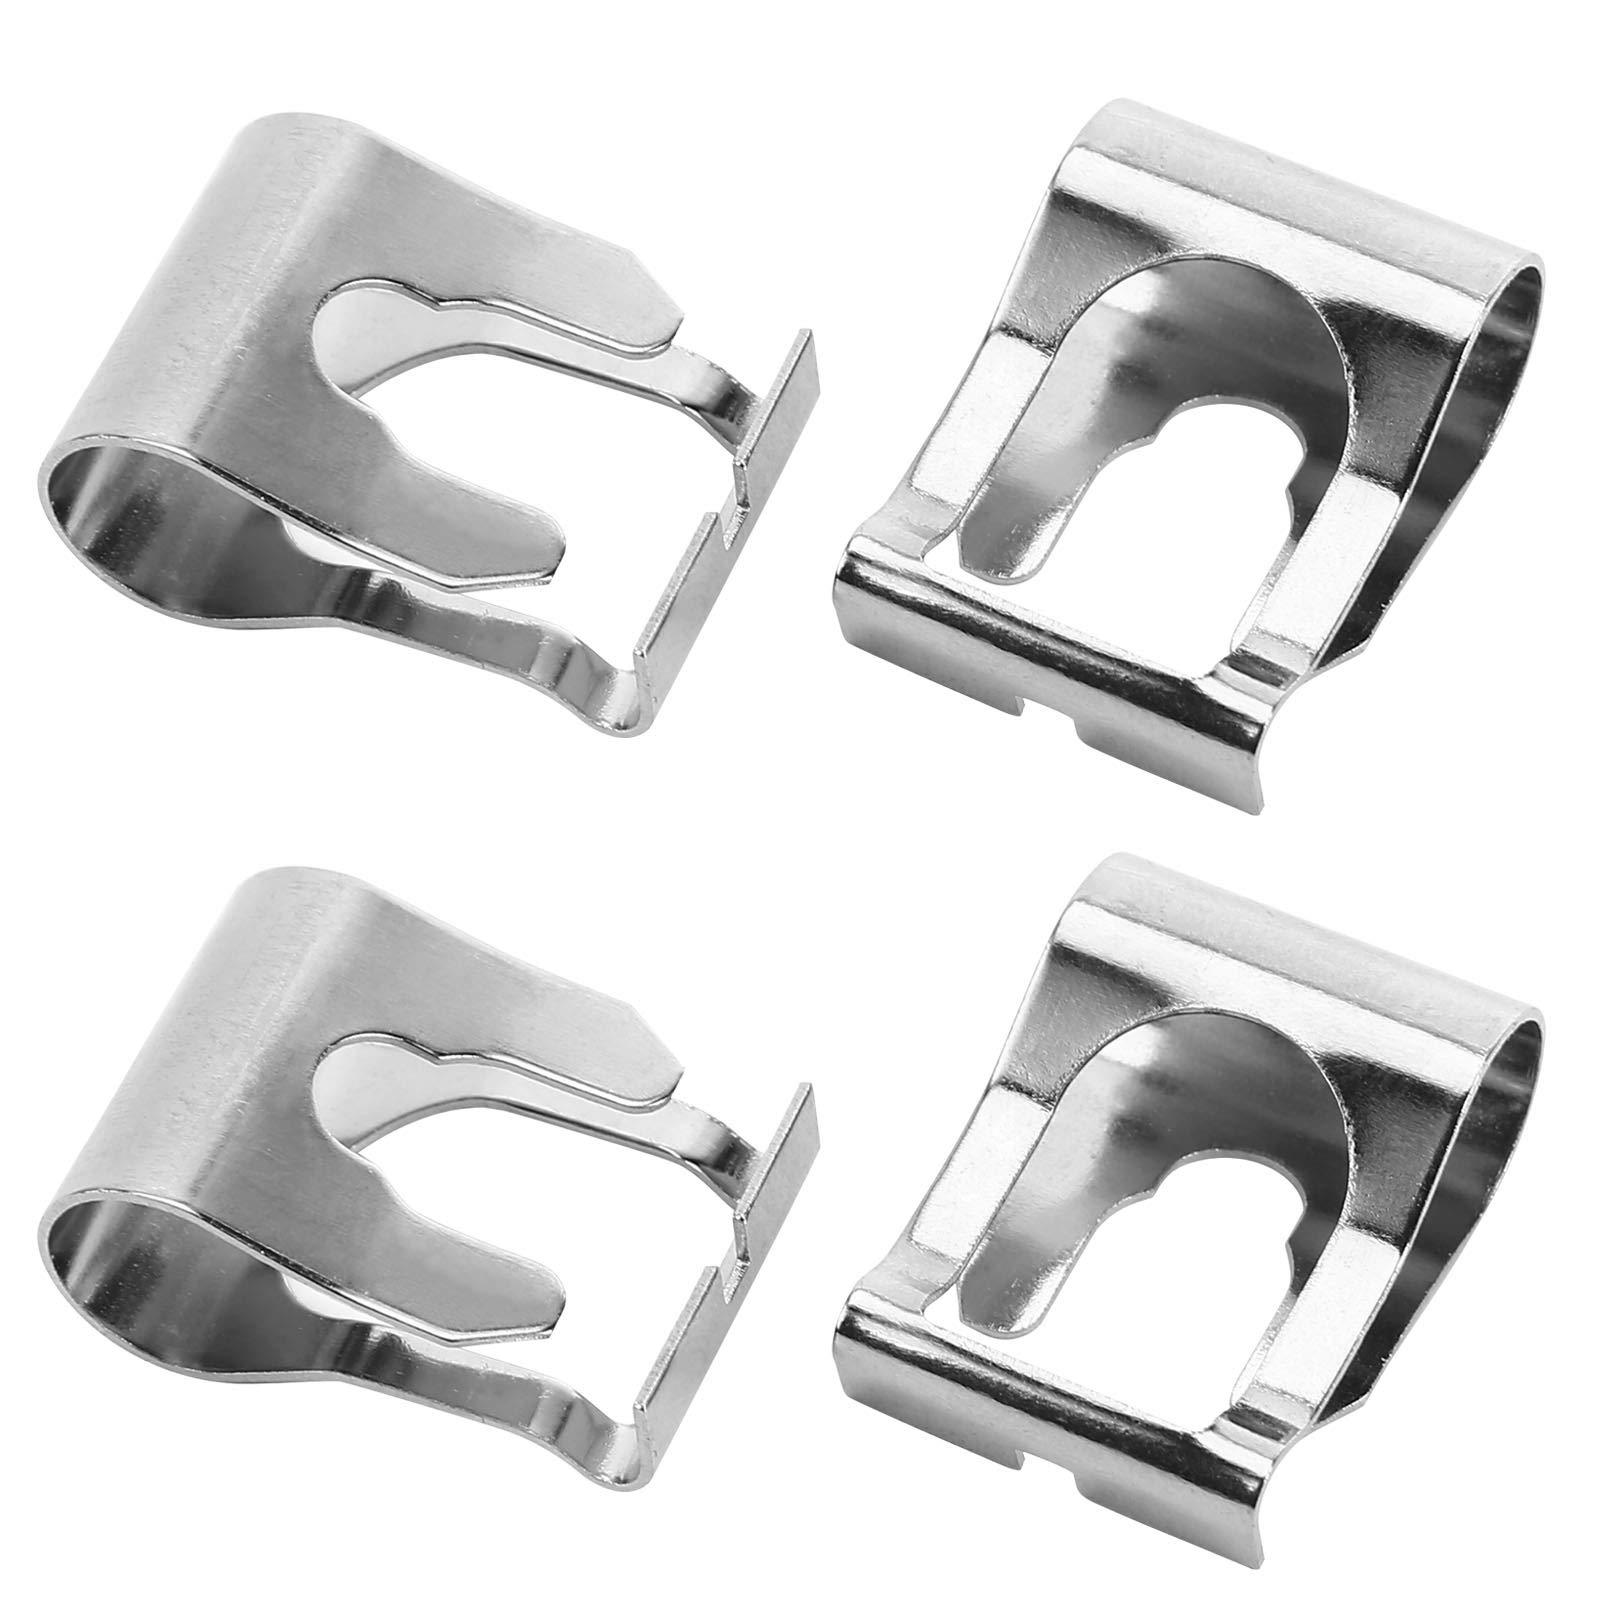 SurePromise Manifold Swirl Flap Rod Repair Kit Set of 4